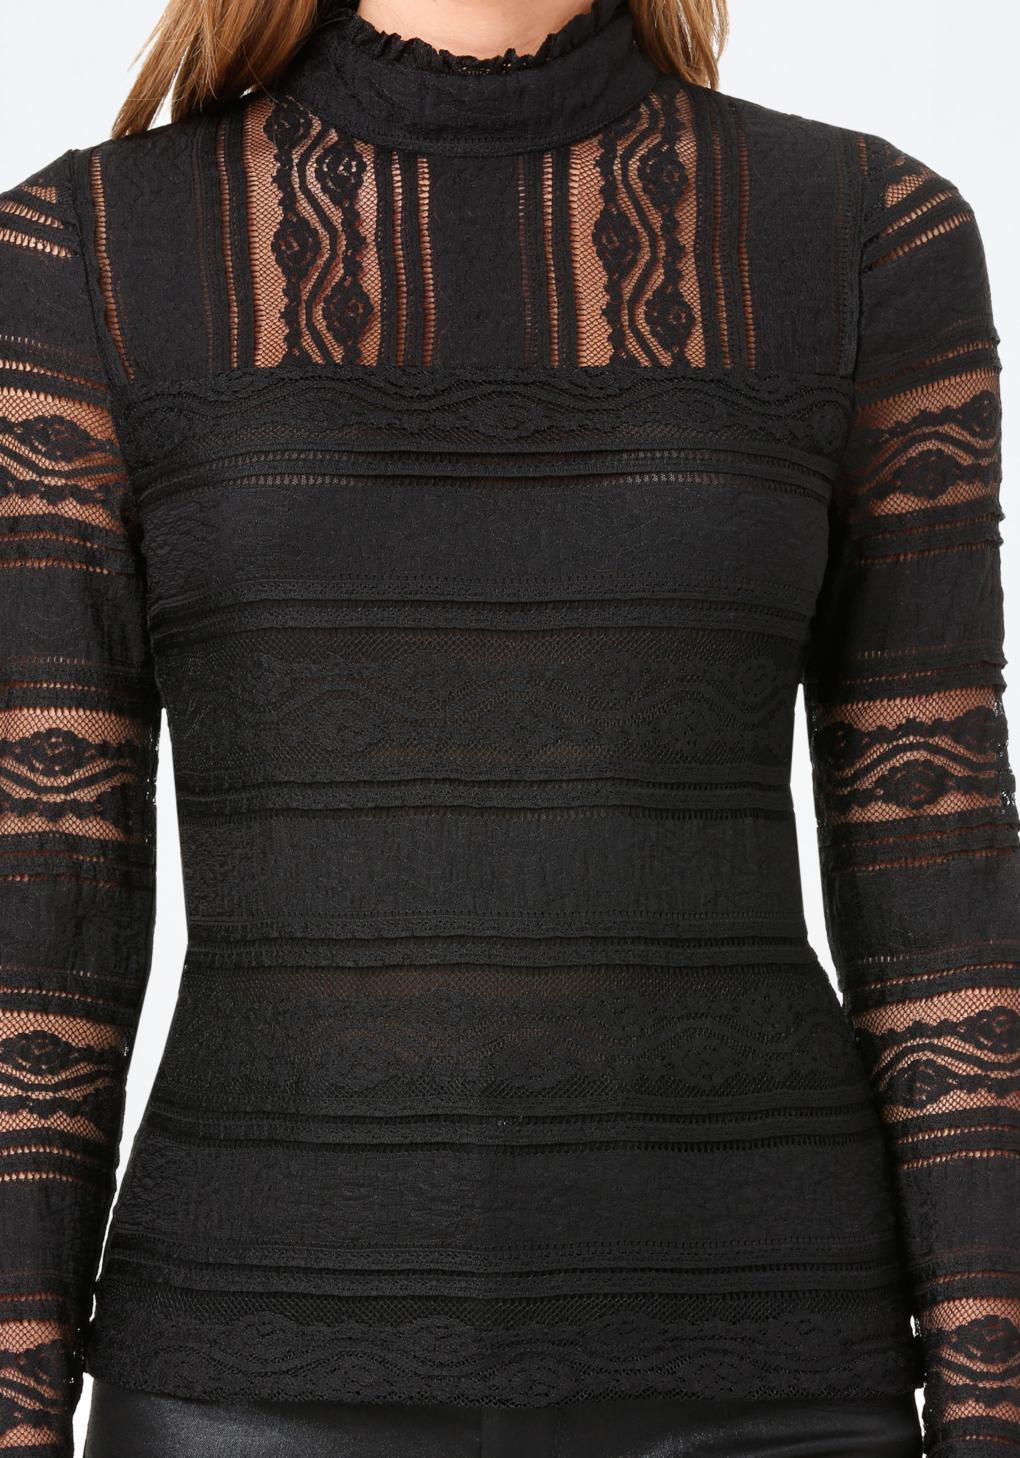 Bebe Lace Panel Mock Neck Top in Black